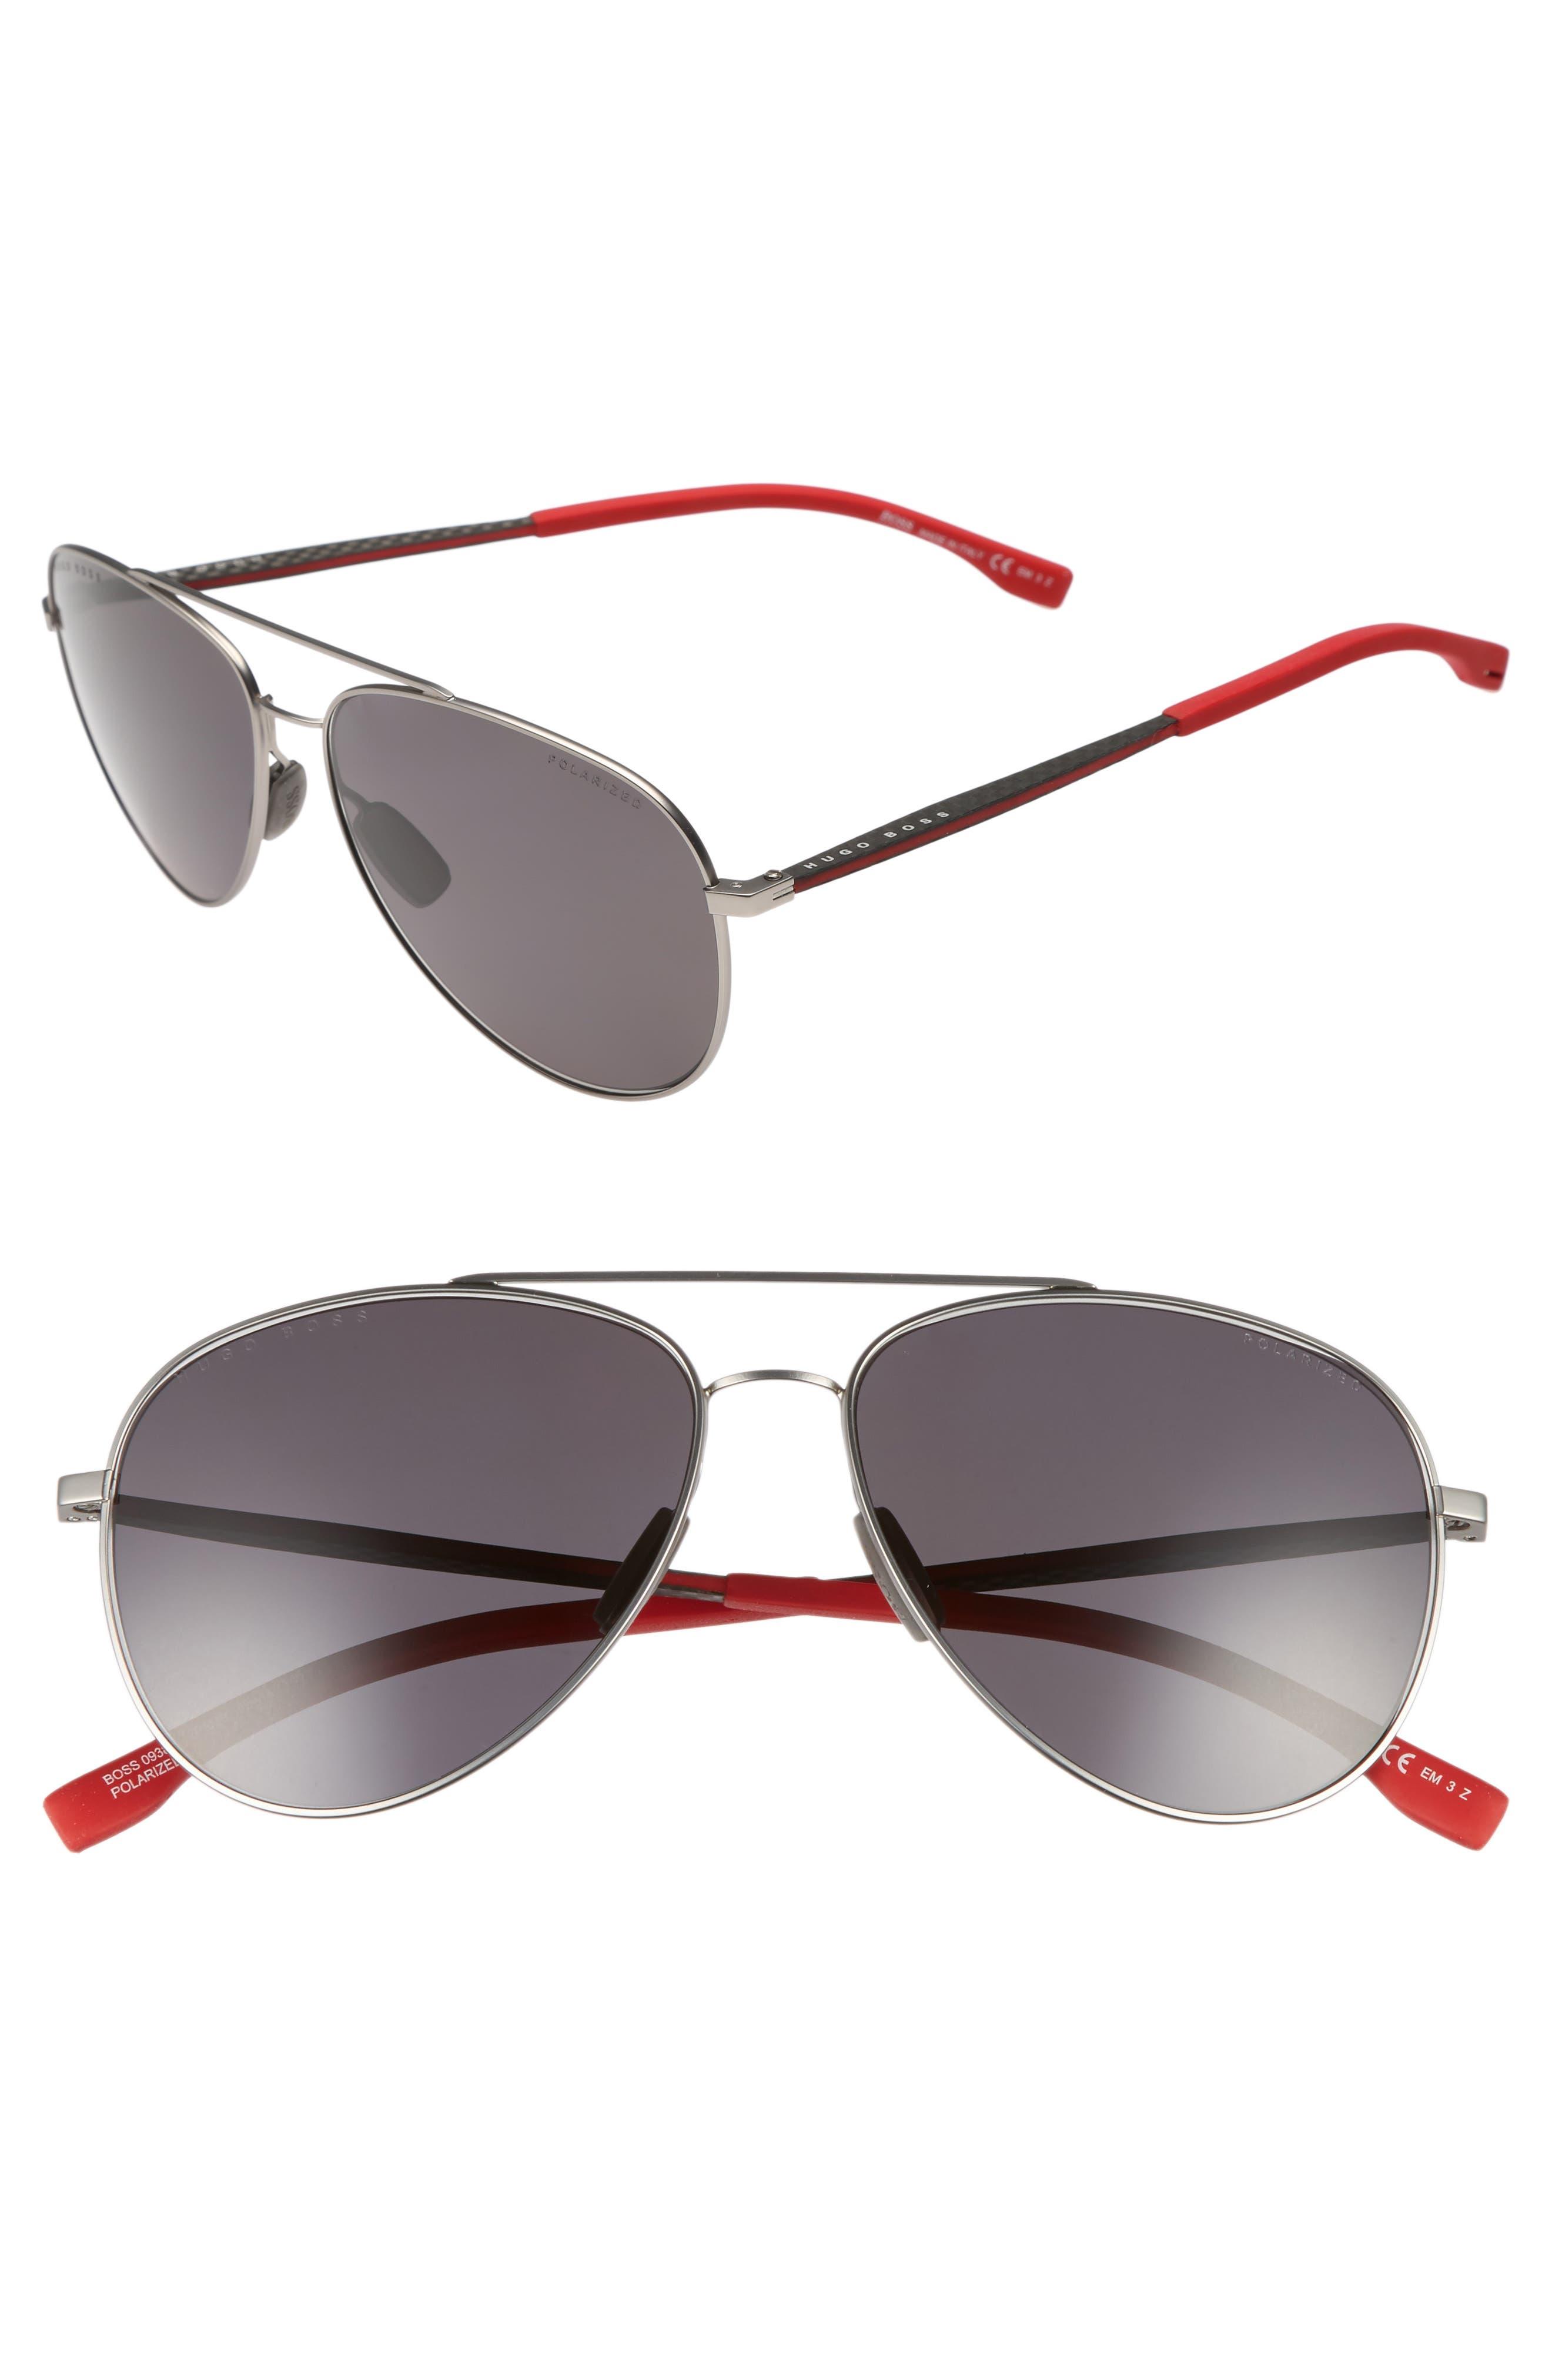 59mm Aviator Sunglasses,                             Main thumbnail 1, color,                             GREY RUBBER/ GREY